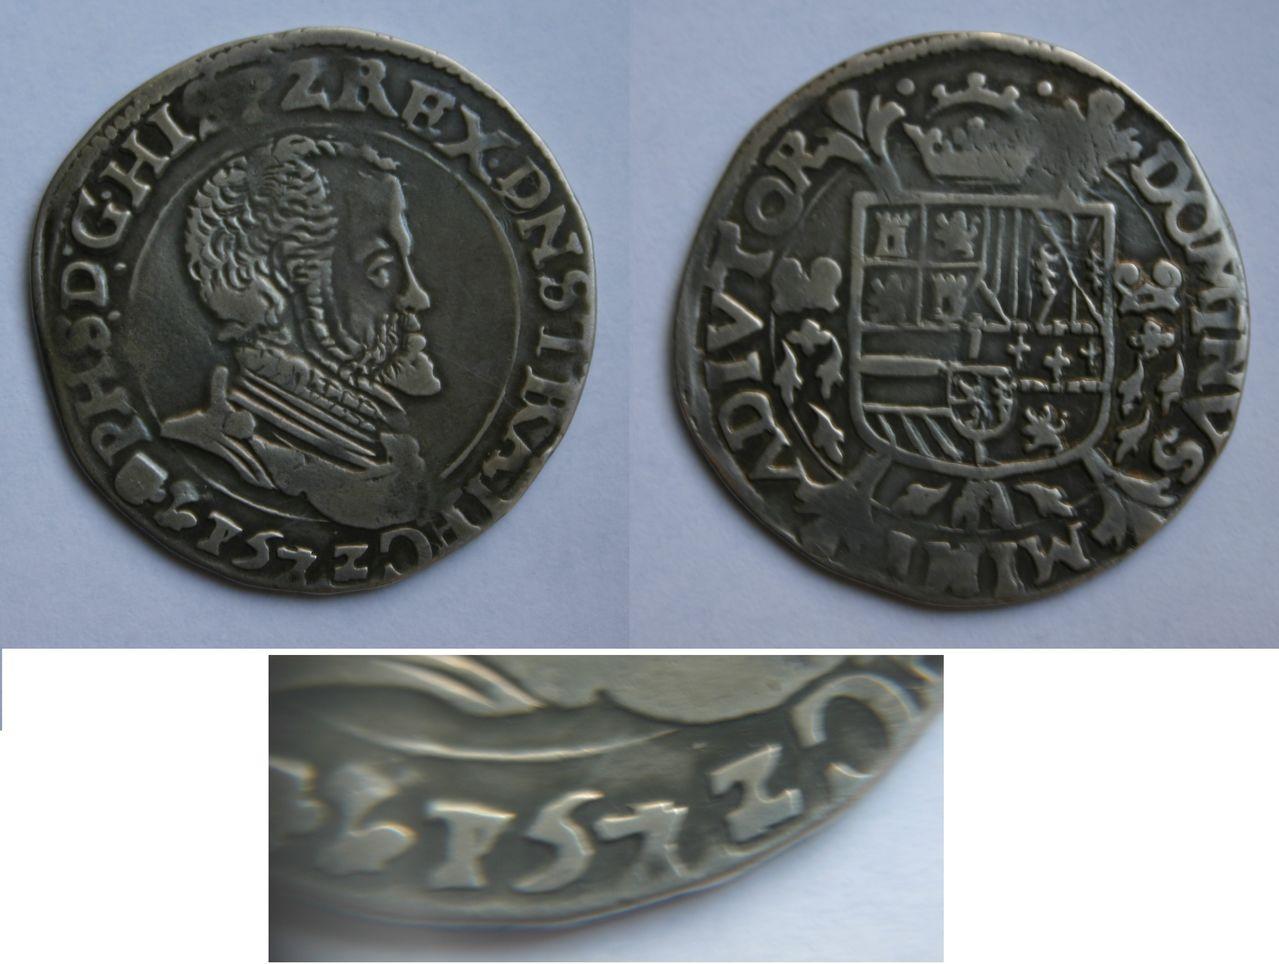 1/5 escudo 1572 sobre 1751. Felipe II. Utrecht. 1_5_Philipsdaalder_Utrecht_1751_1572